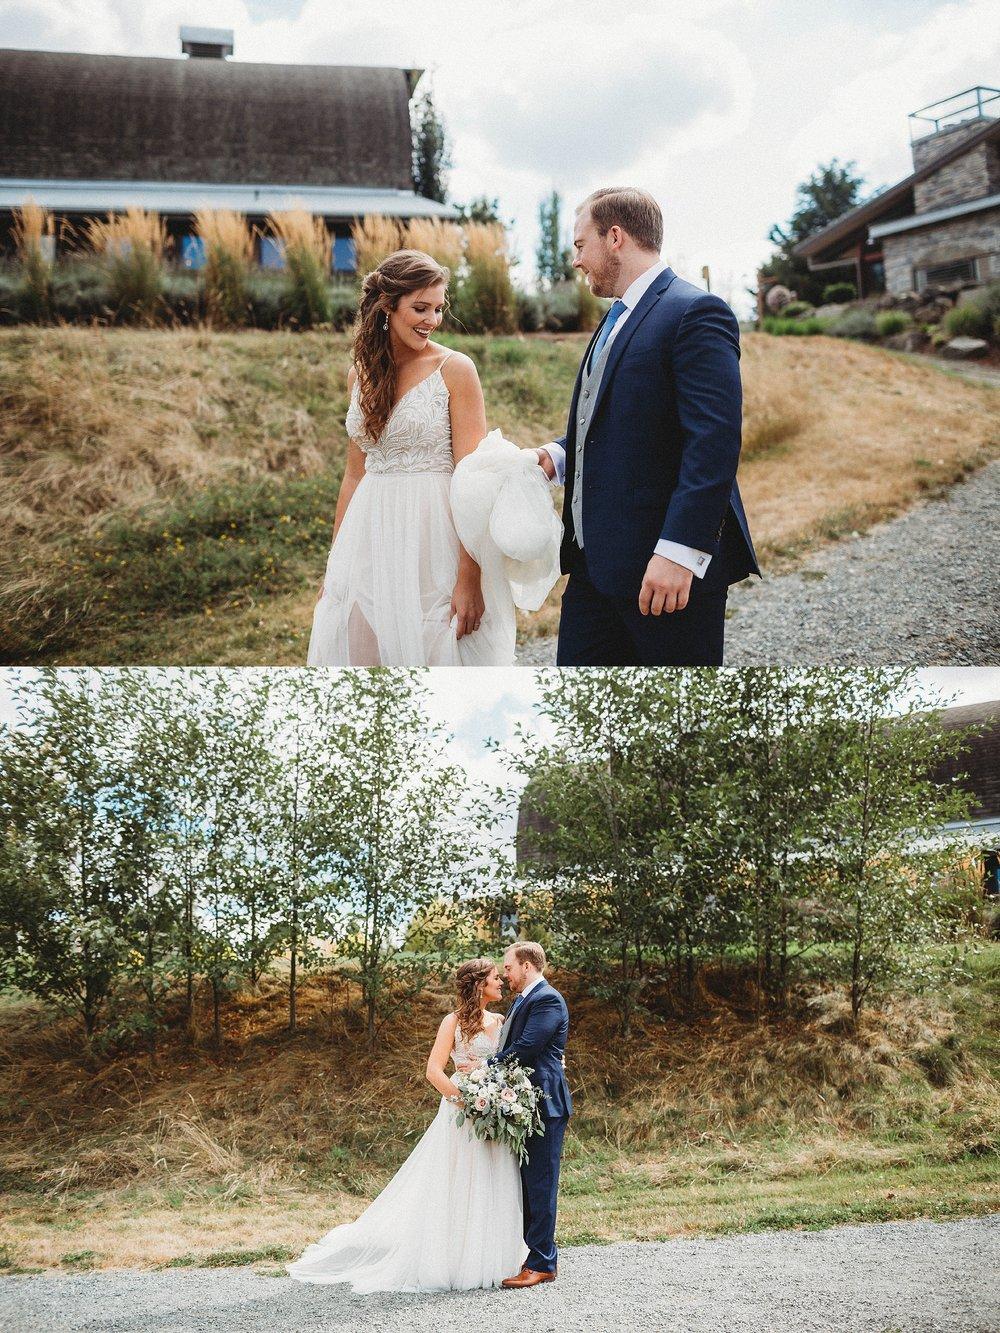 olson mansion wedding photography - jill and garrett - ashley vos photography - seattle area wedding photographer-28.jpg